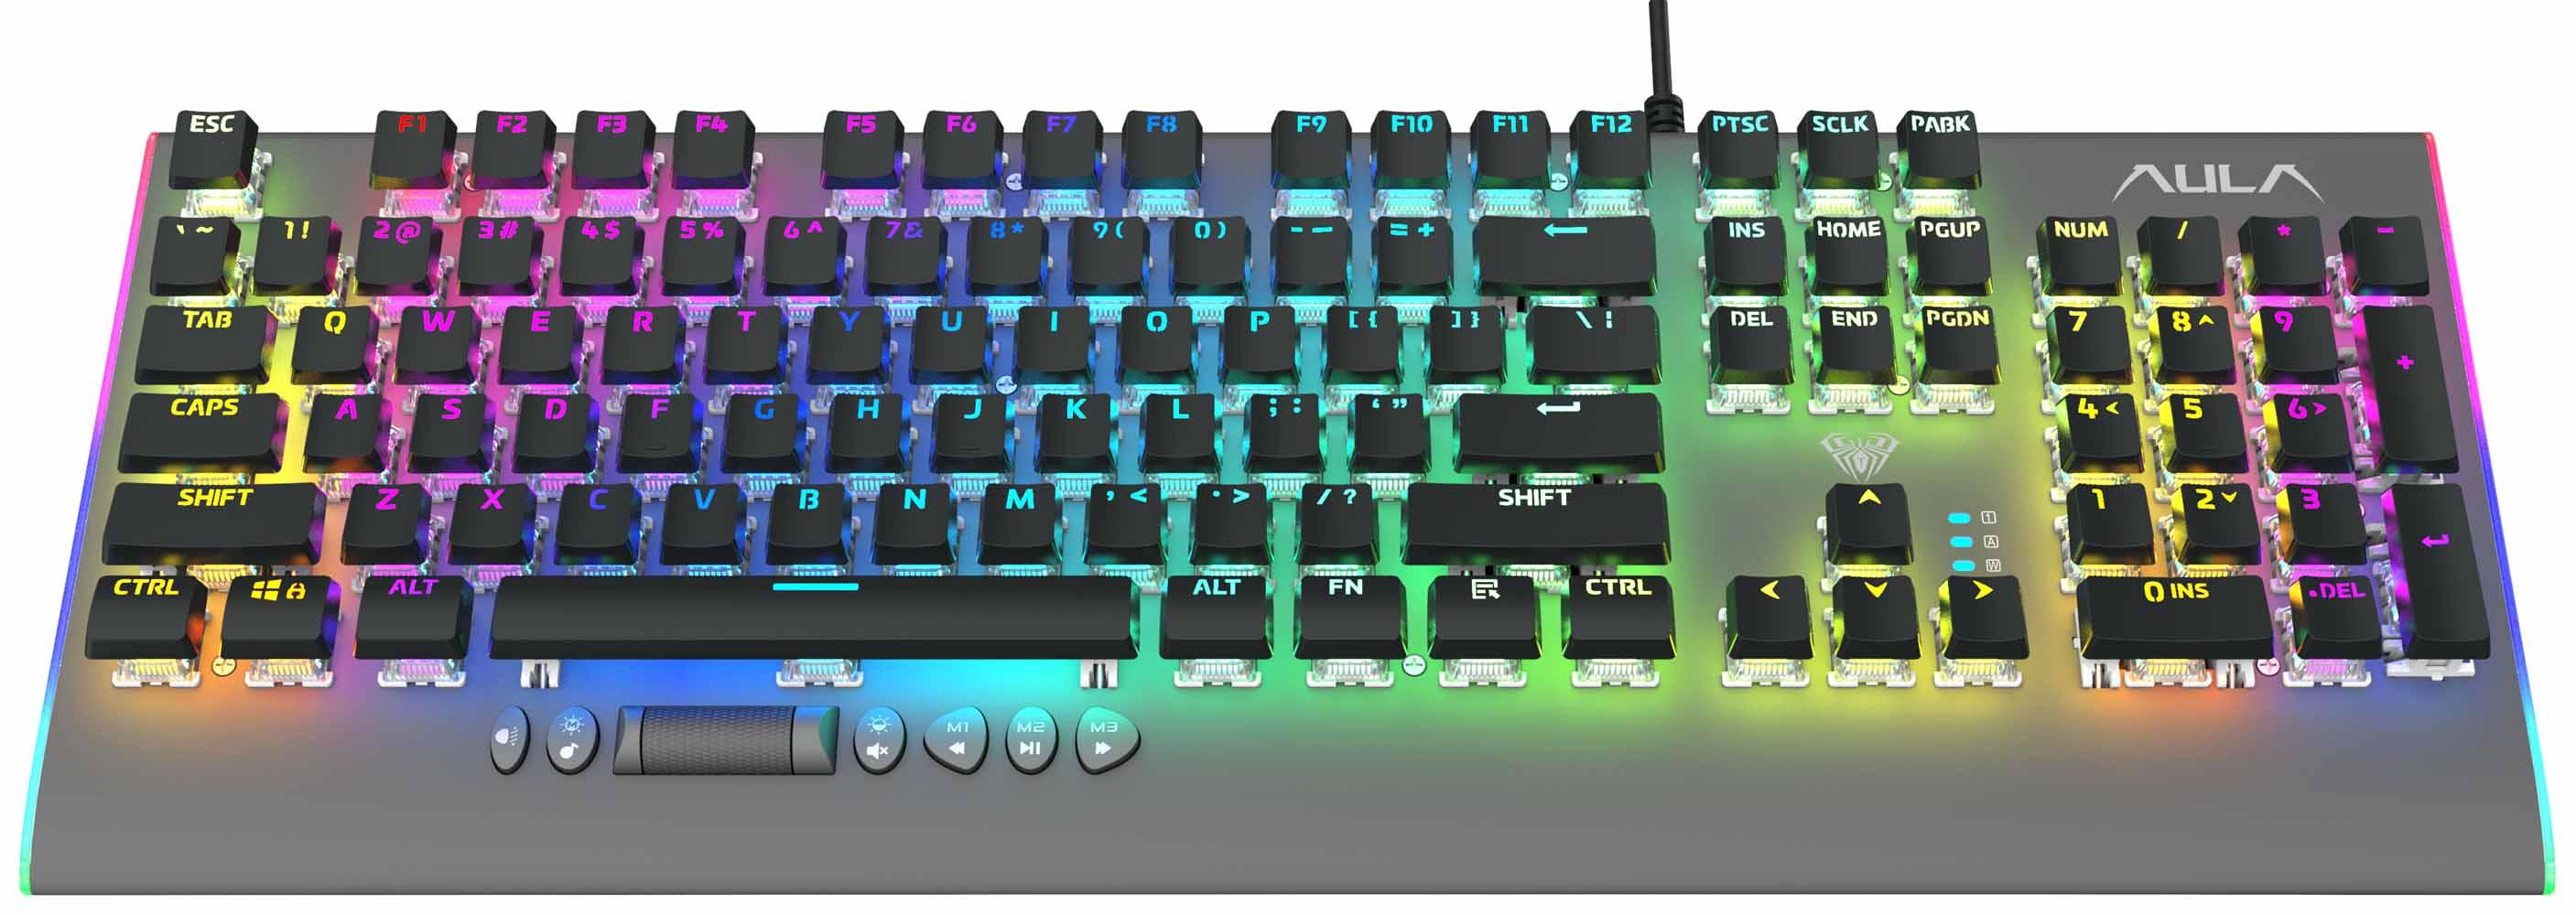 AULA μηχανικό πληκτρολόγιο F2099, RGB, μαύρο-γκρι - AULA 36560